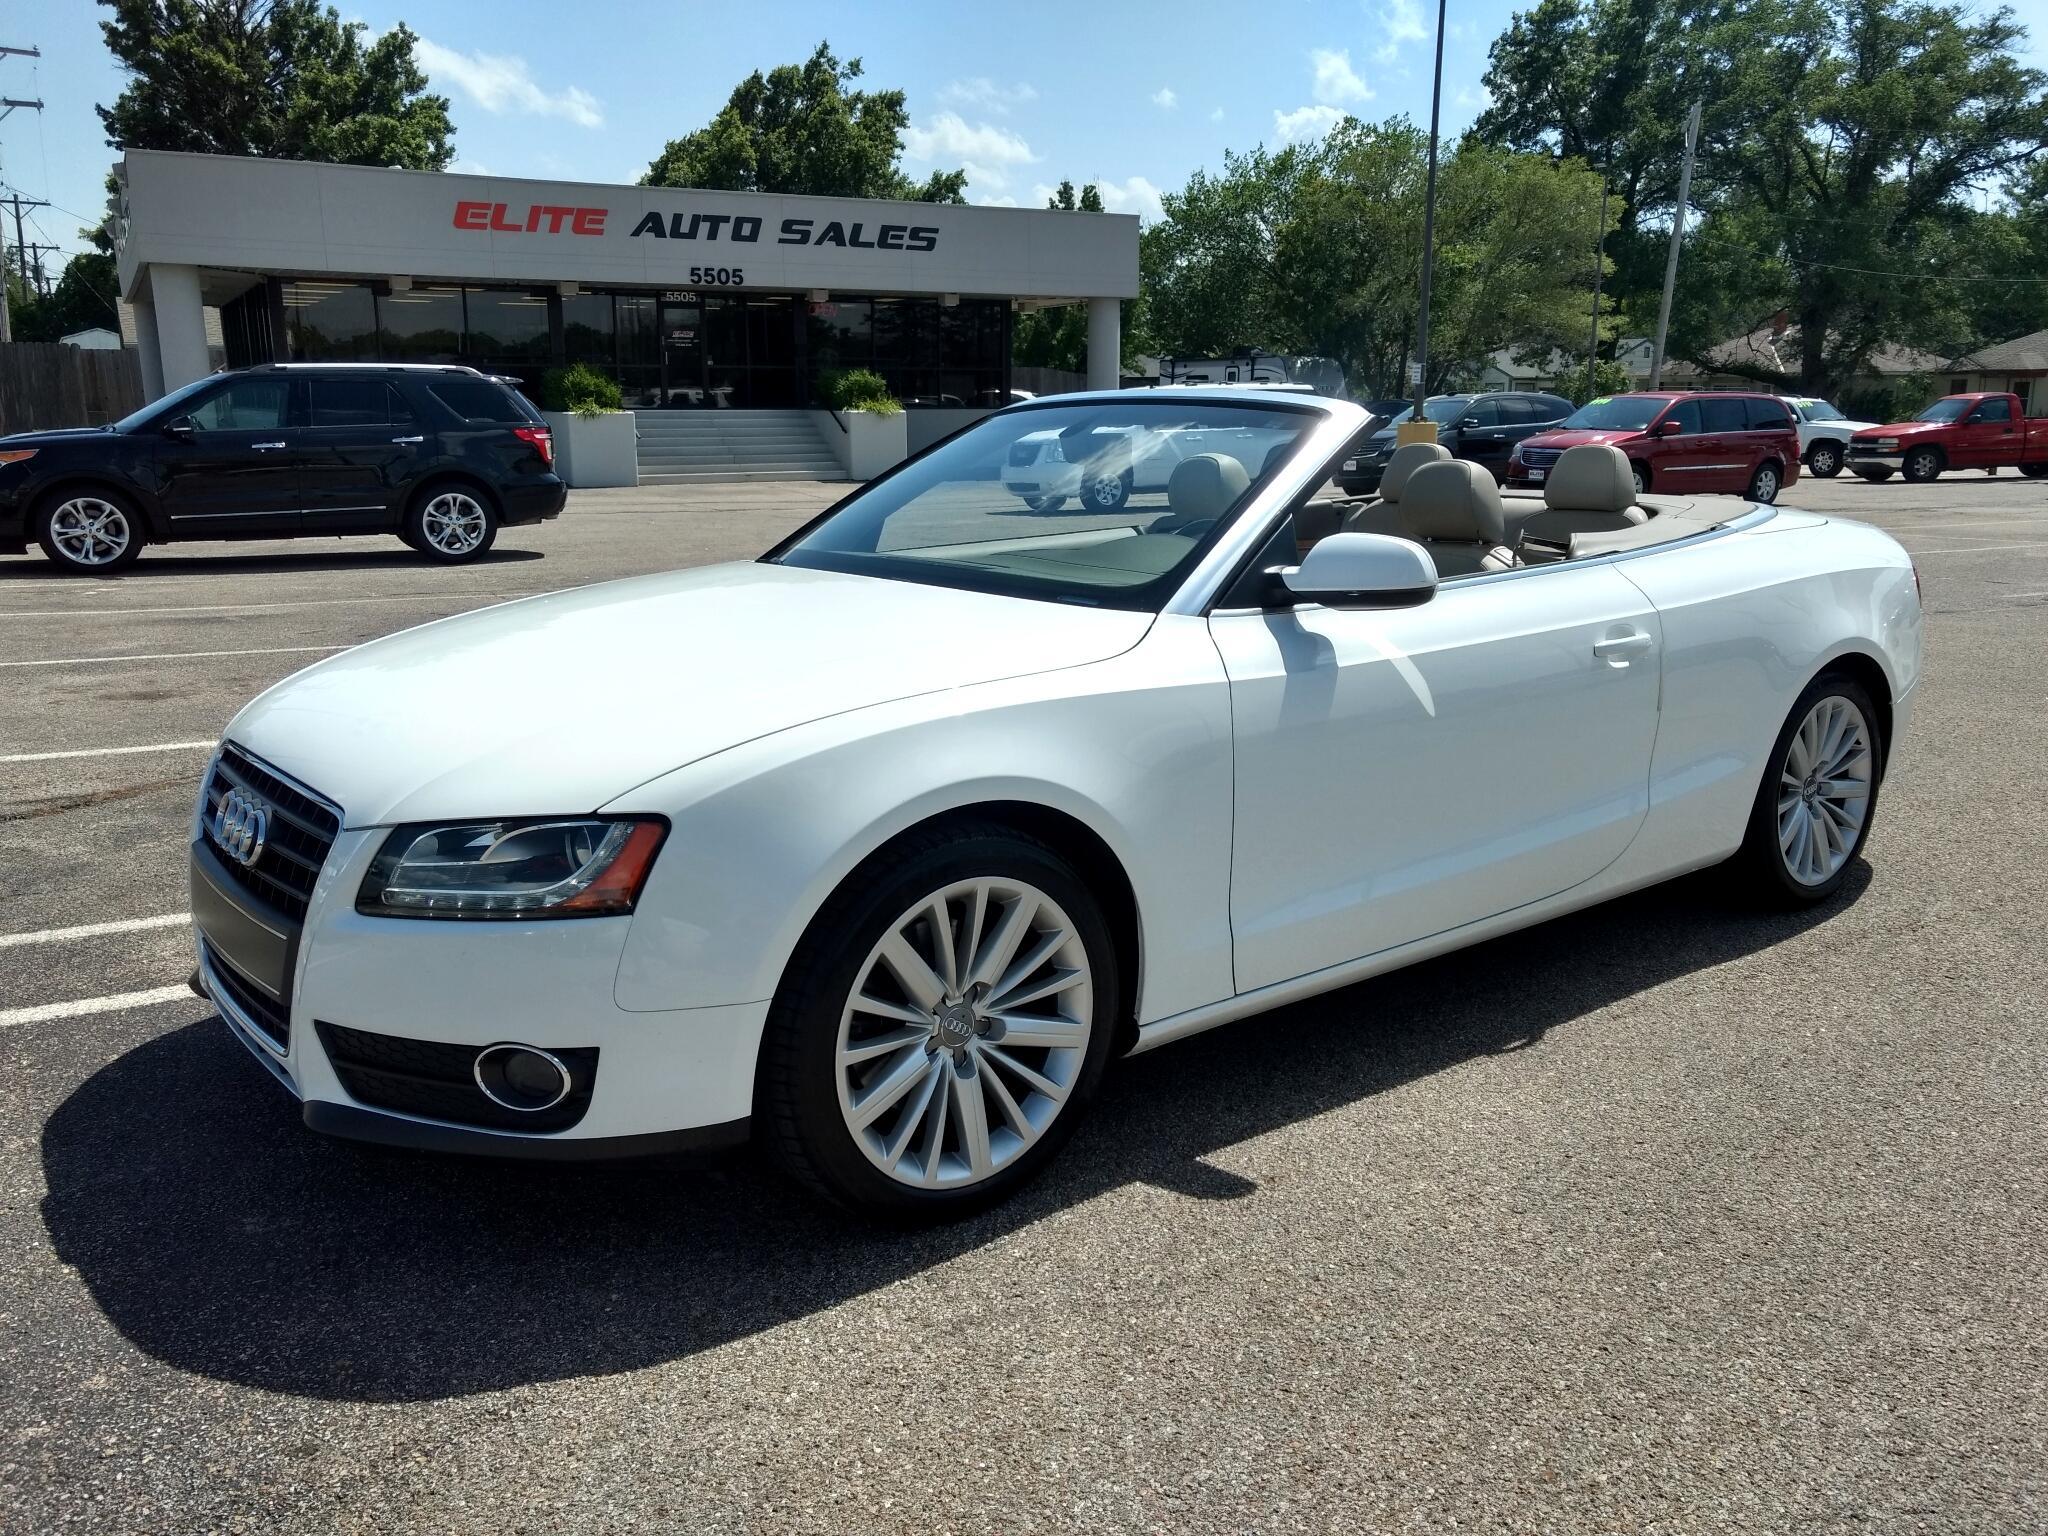 Used Cars Wichita Ks >> Used Cars For Sale Wichita Ks 67218 Elite Auto Sales